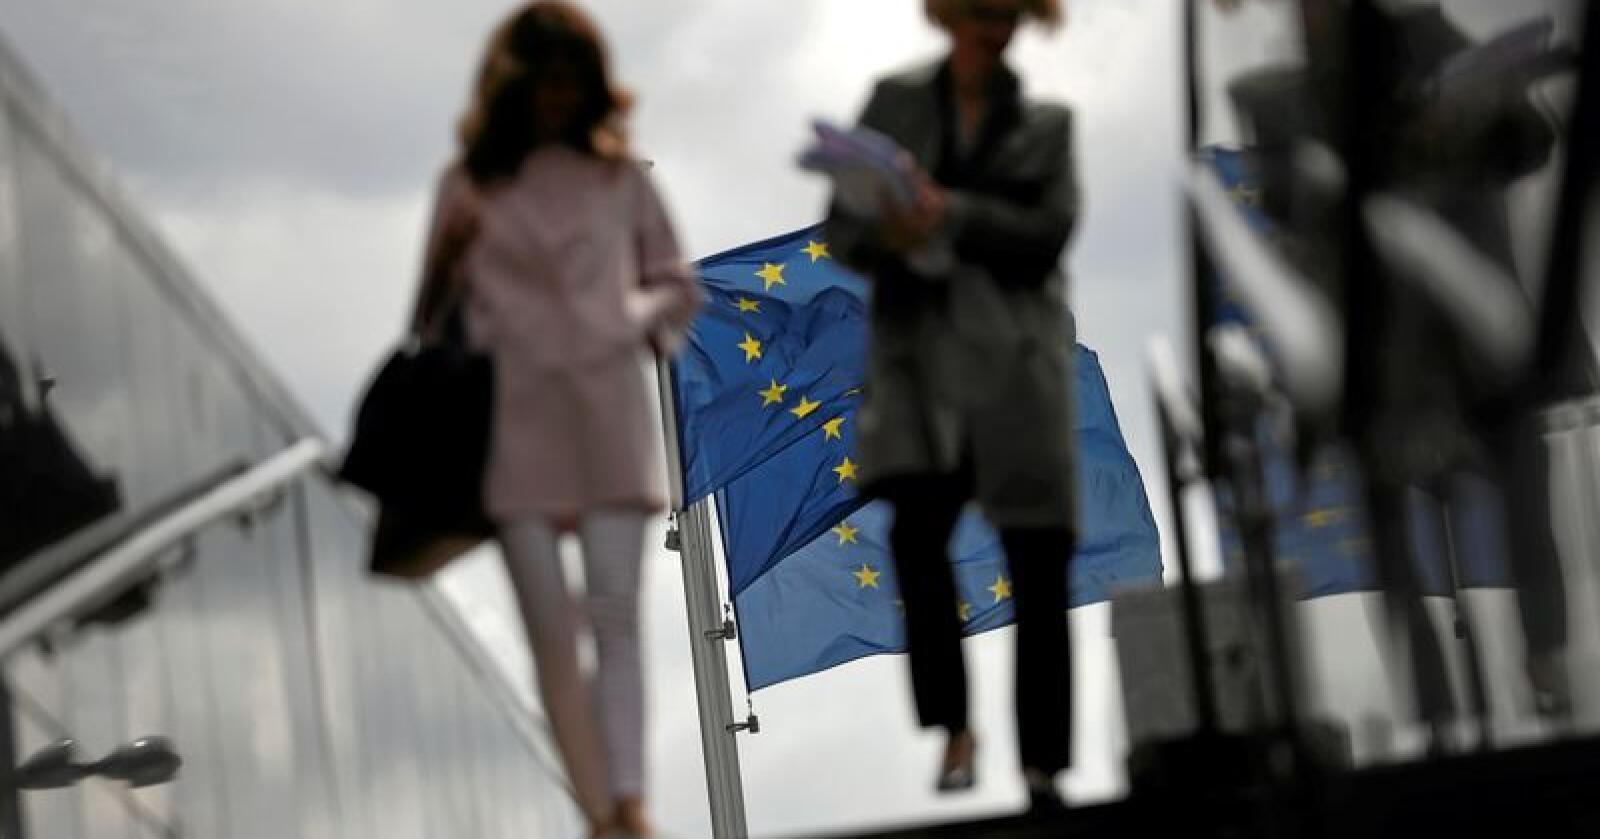 EU-valg: EUs medlemsland har nettopp gjennomført valg til unionens parlament. Foto: Francisco Seco/AP/NTB scanpix